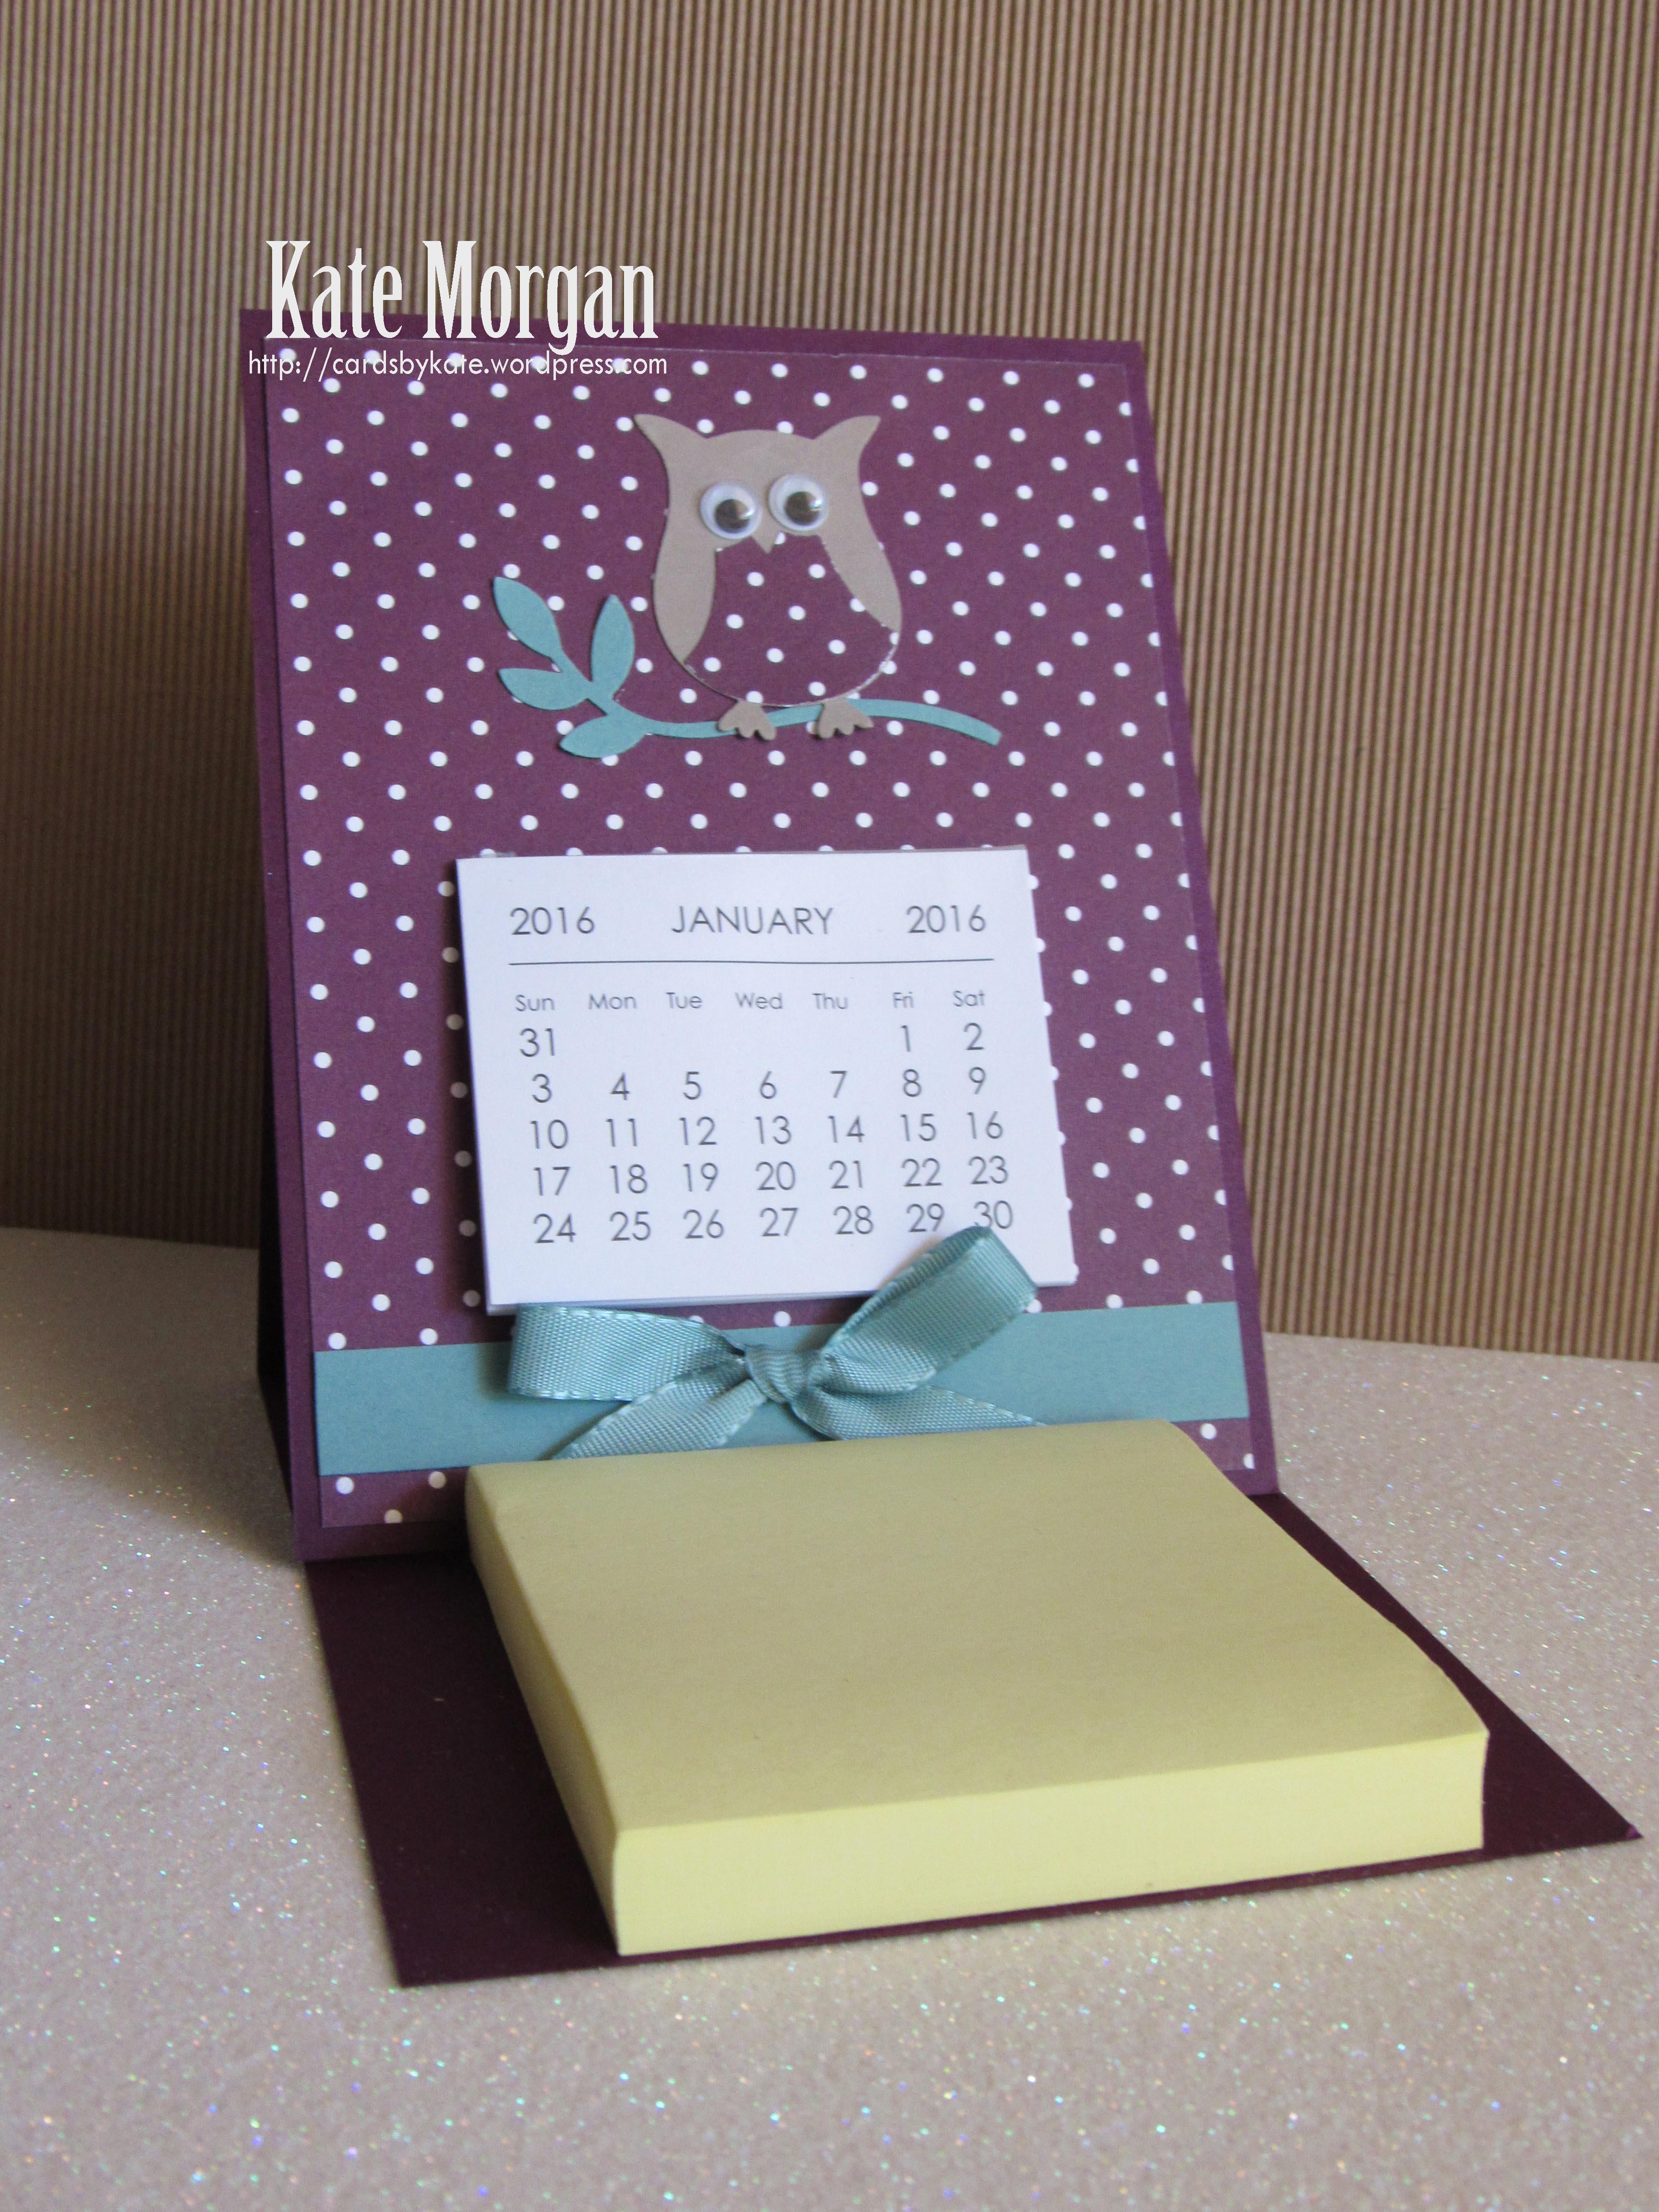 Easel Calendar Amp Post It Note Card Kate Morgan